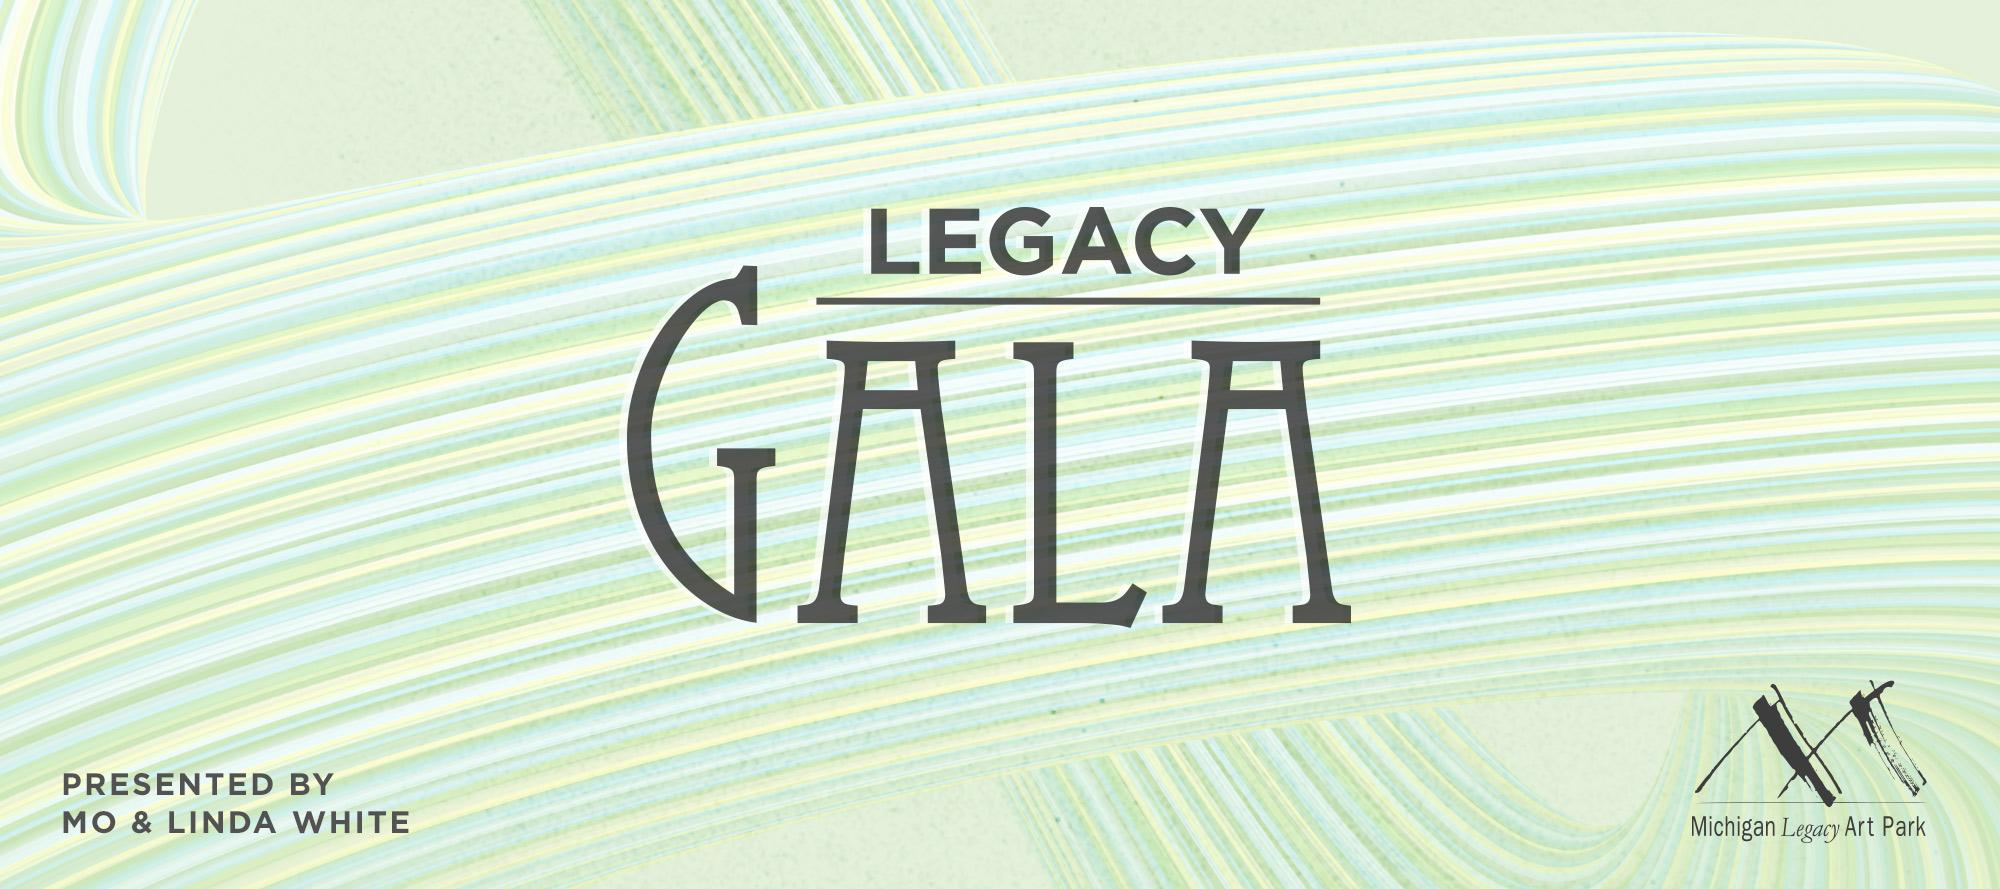 2018 Legacy Gala